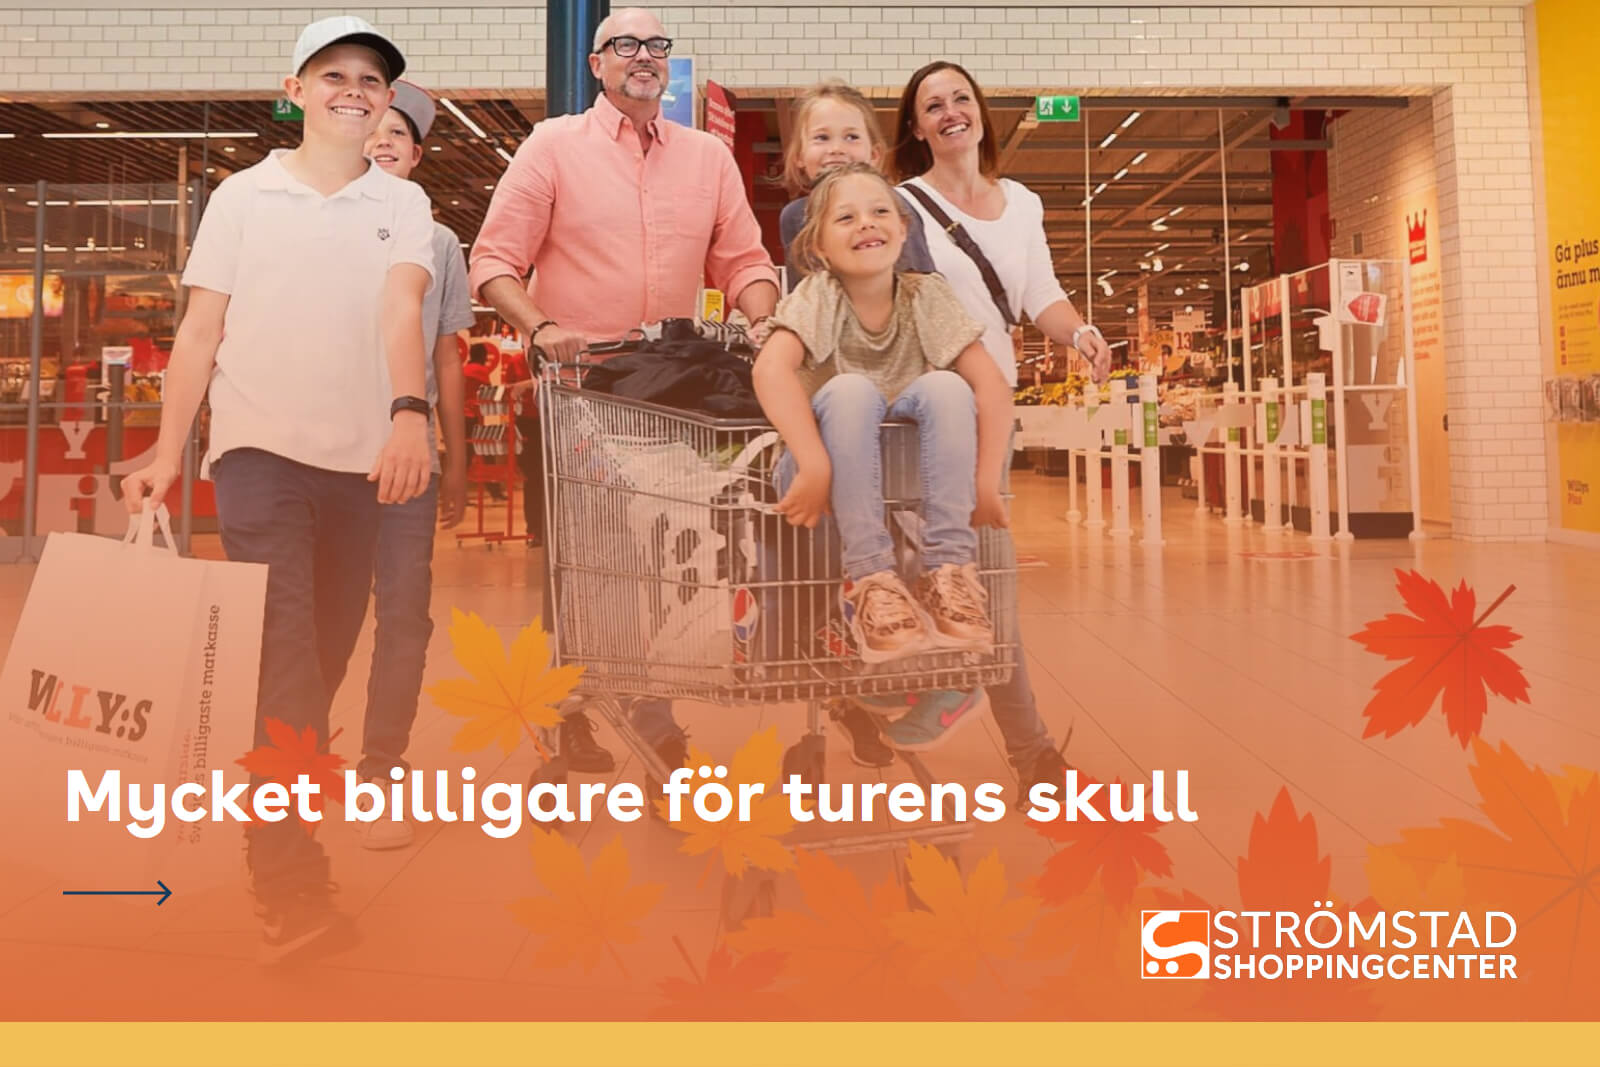 Strømstad shoppingcenter webside